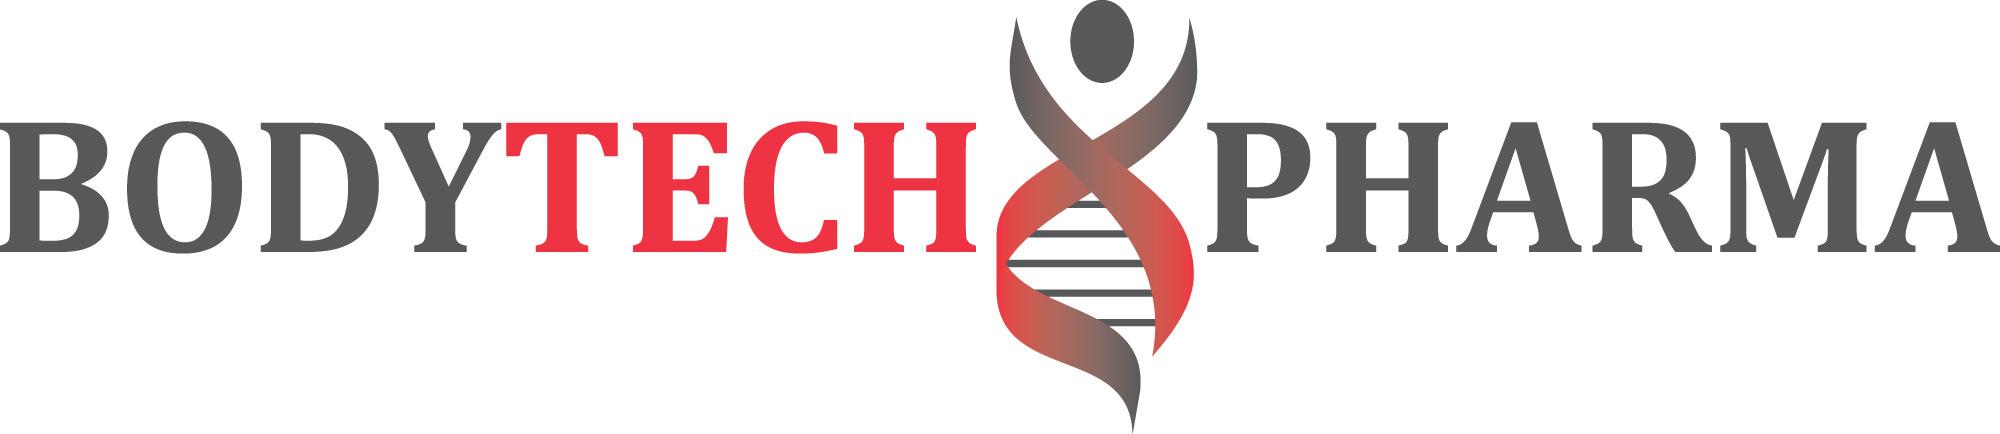 Bodytech Pharma